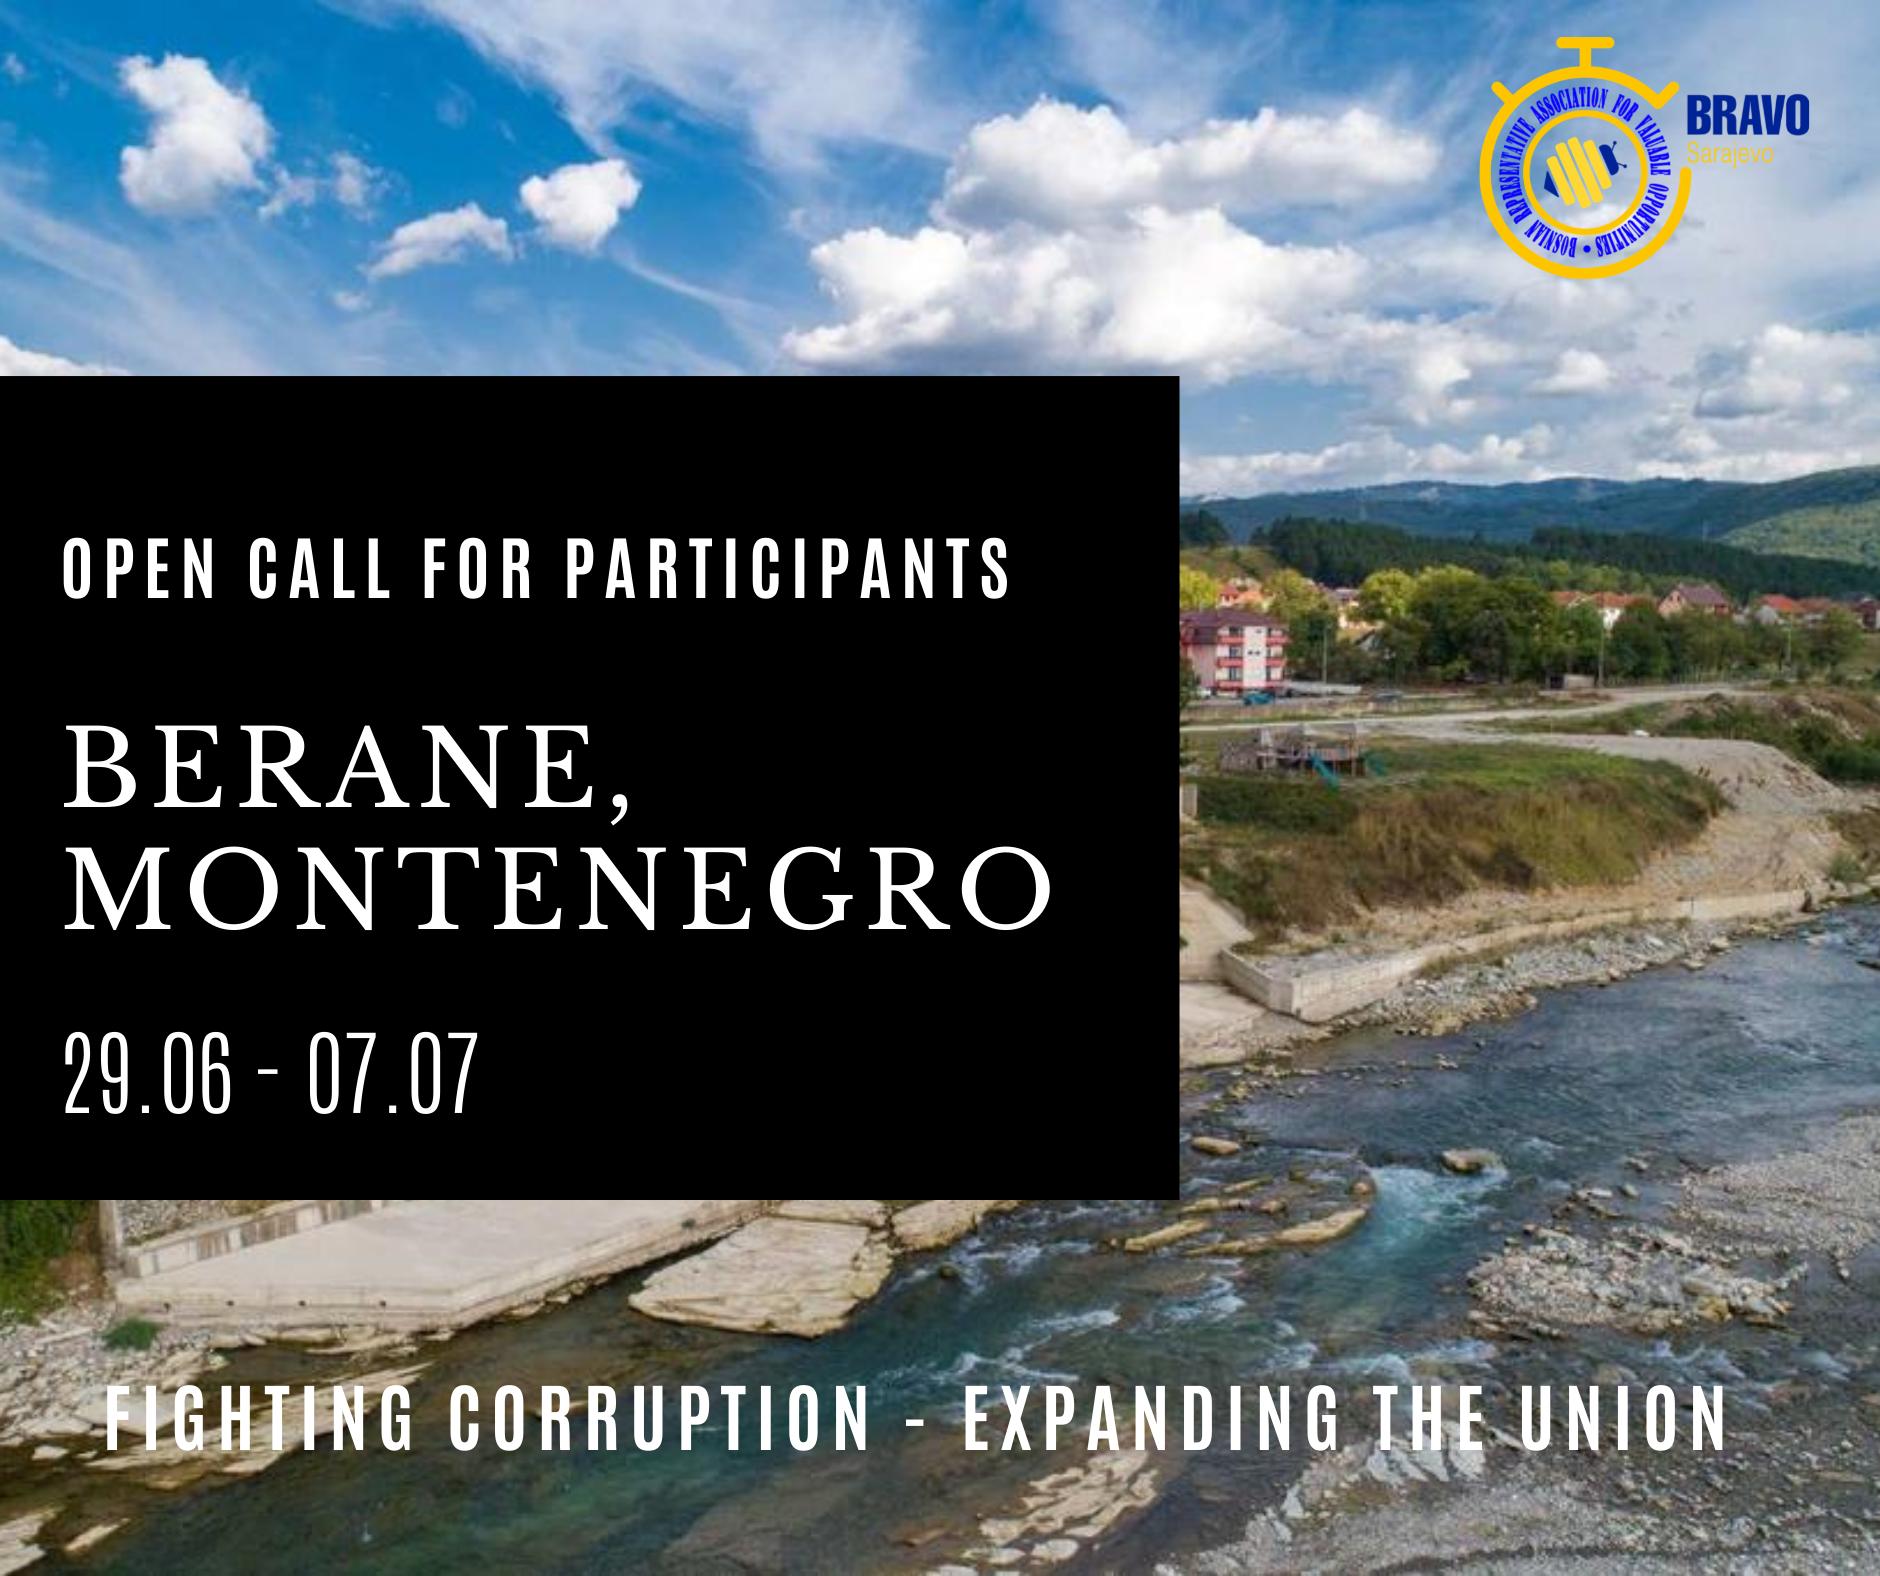 Open Call for 5 participants – Berane, Montenegro